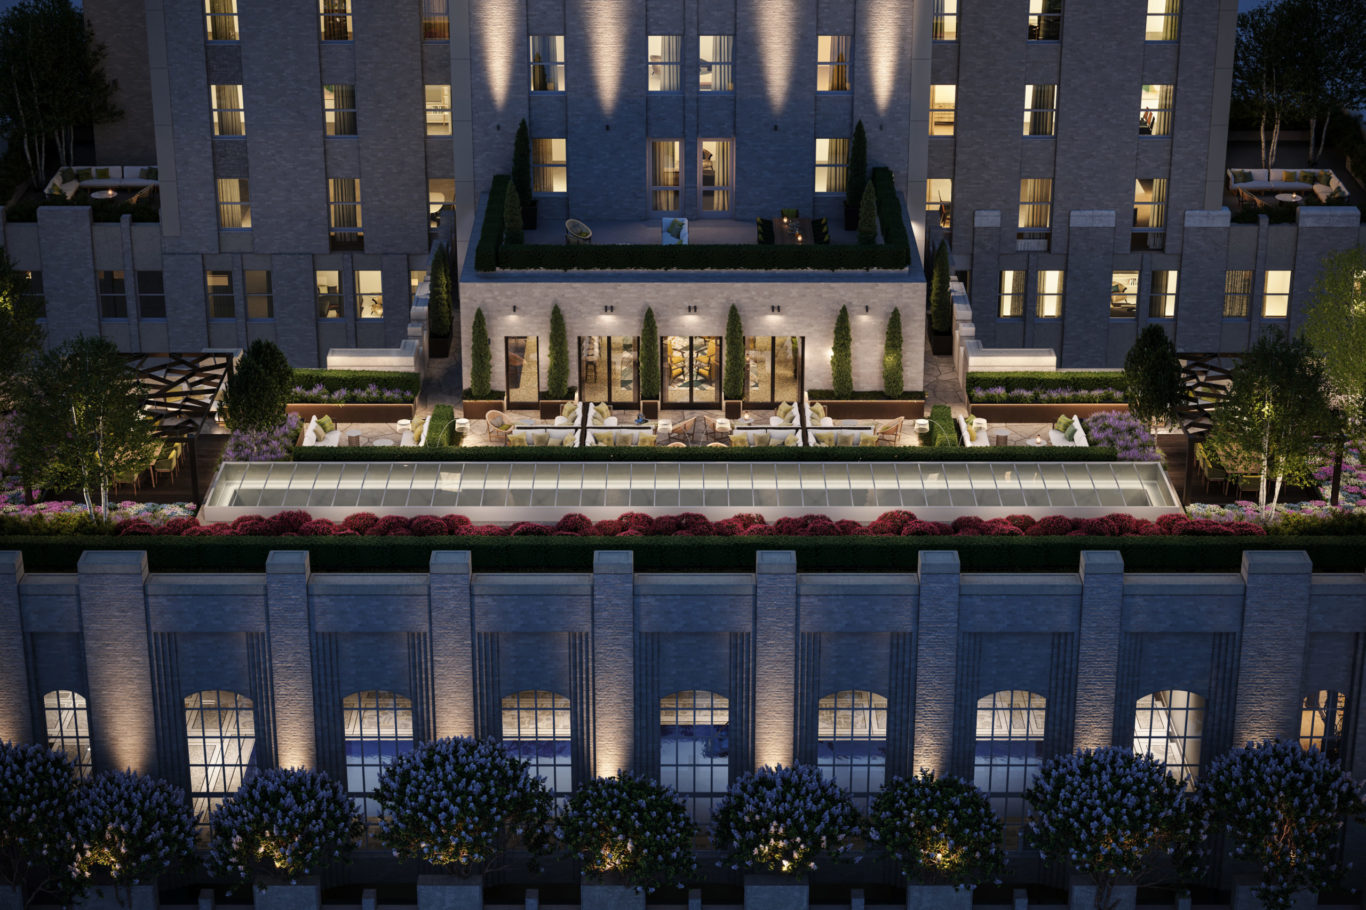 Slide 4 of 5, Waldorf Astoria